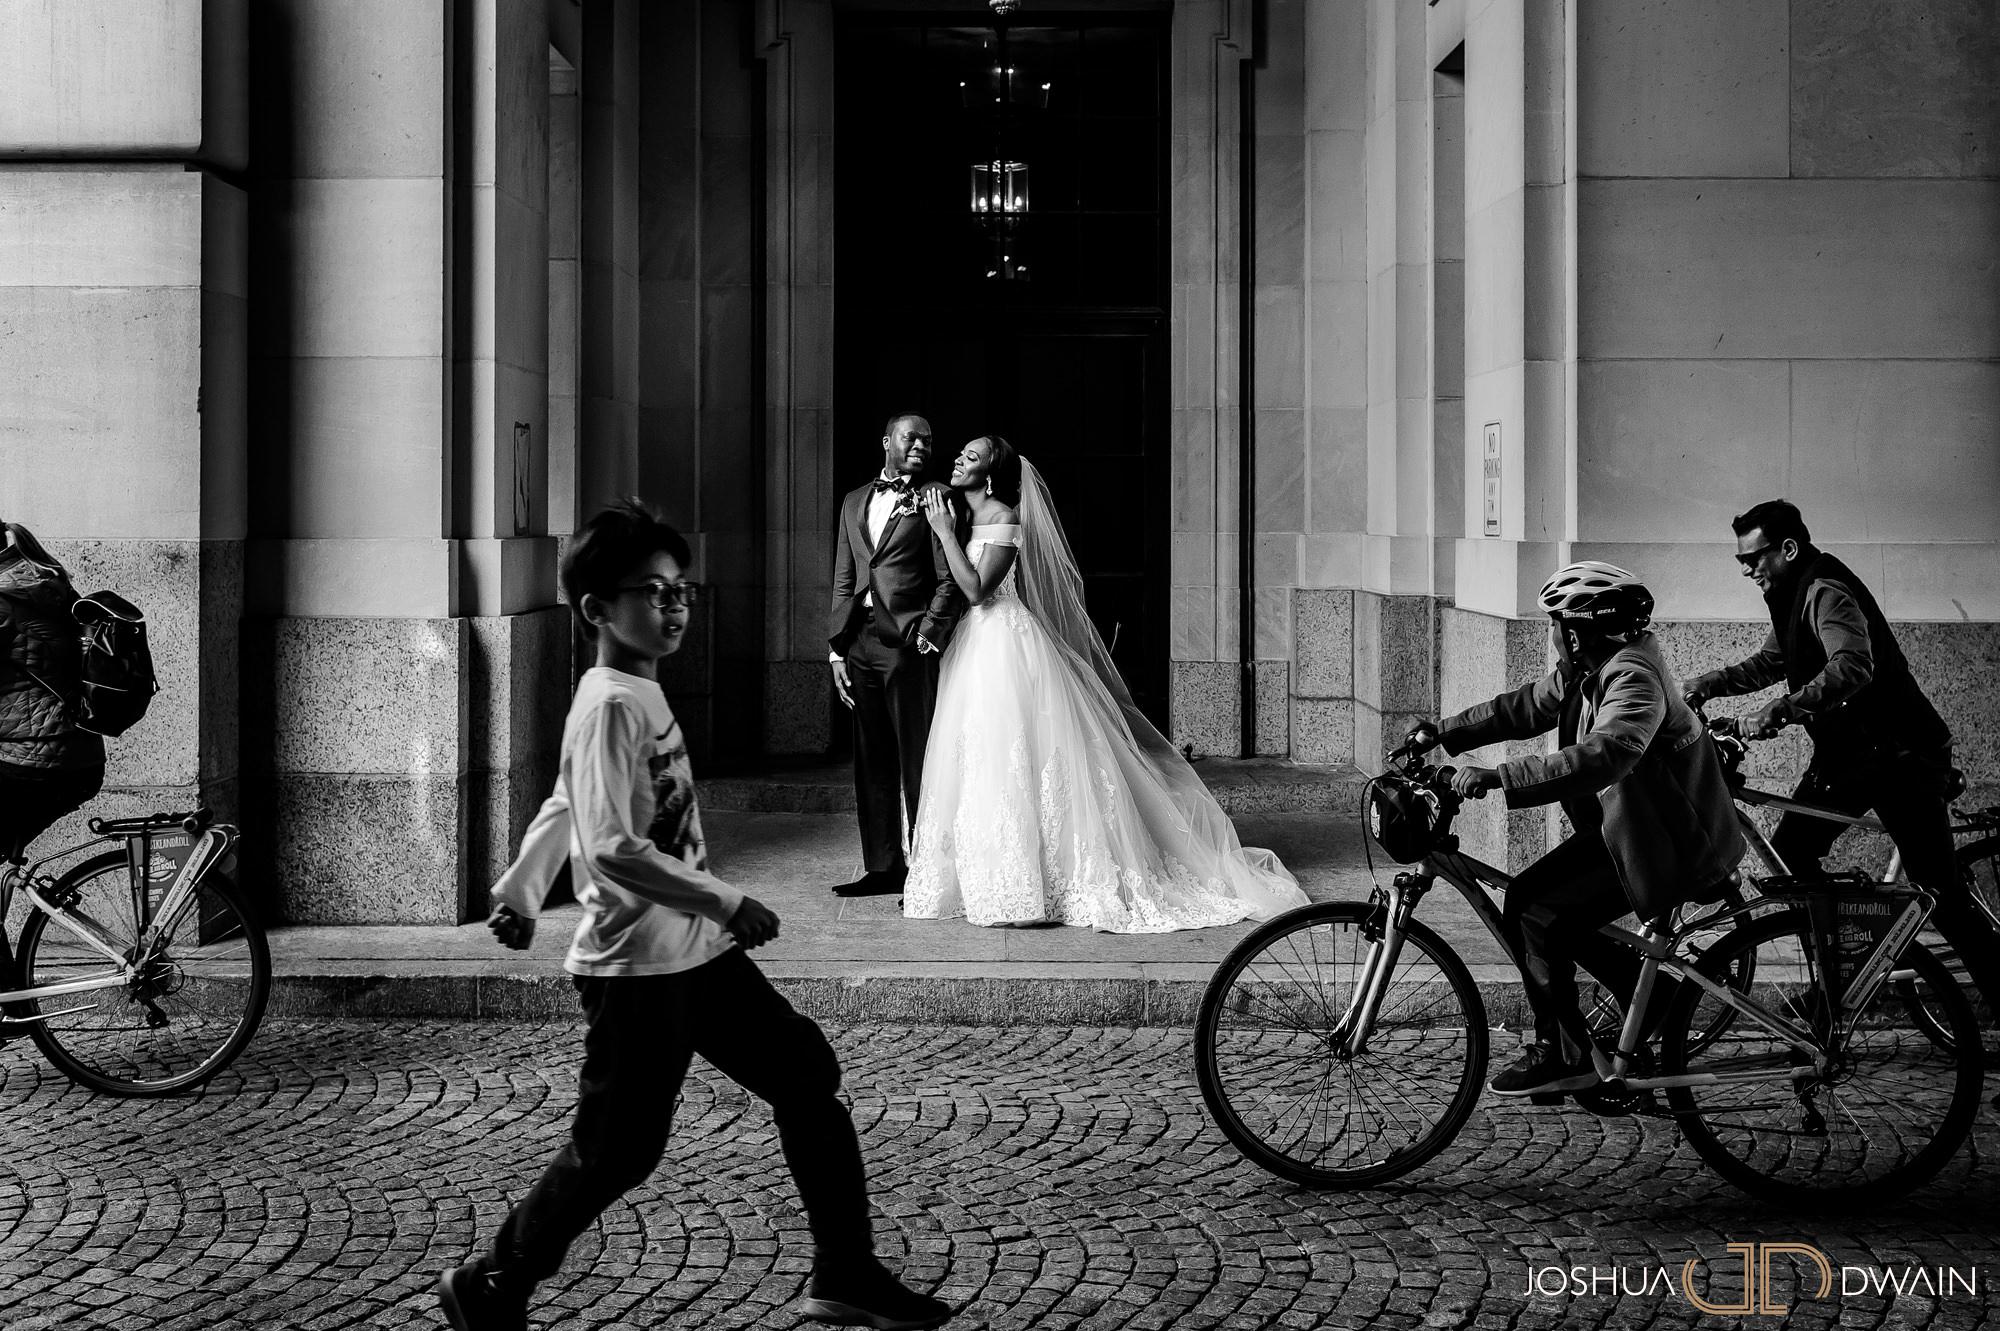 emerald-tolu-023-ronald-reagan-building-trade-center-best-washington-dc-wedding-photographer-joshua-dwain.jpg